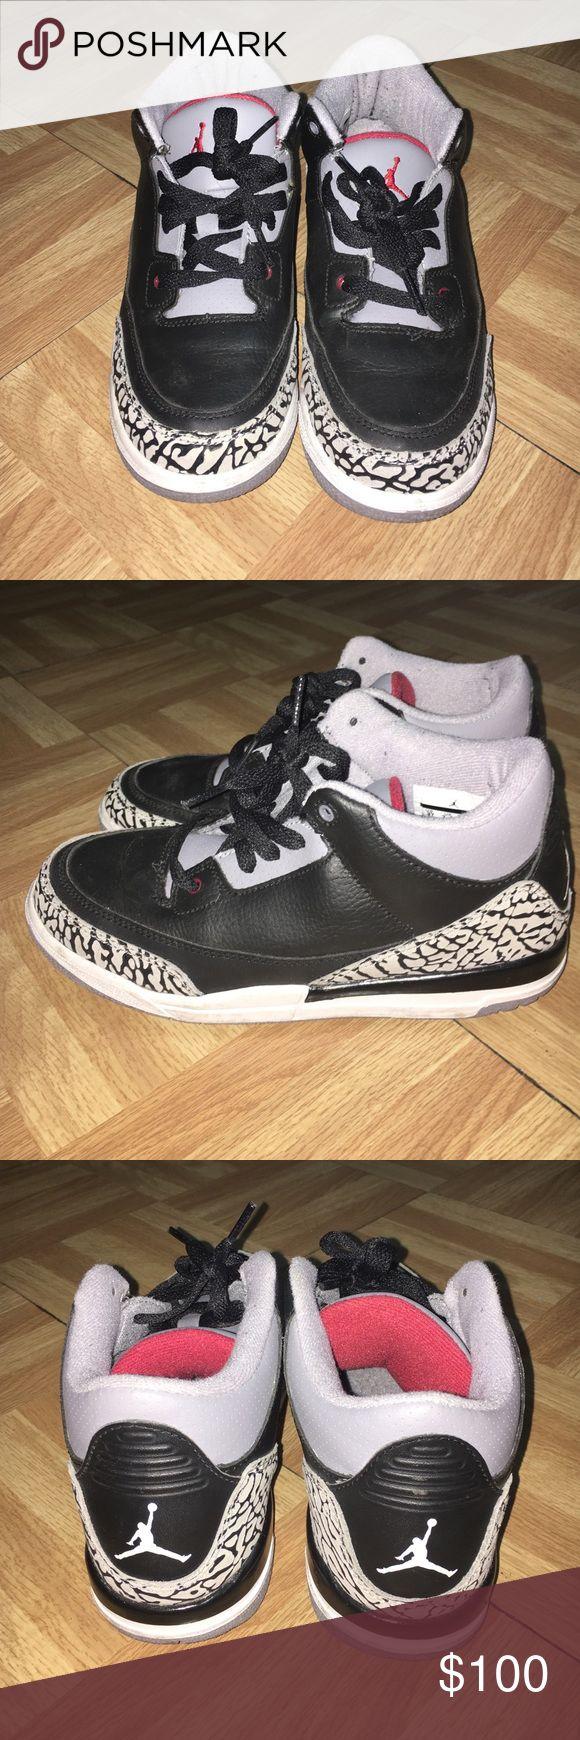 Retro Cement 3 Jordans Size 3 in youth. Excellent condition! Jordan Shoes Sneakers